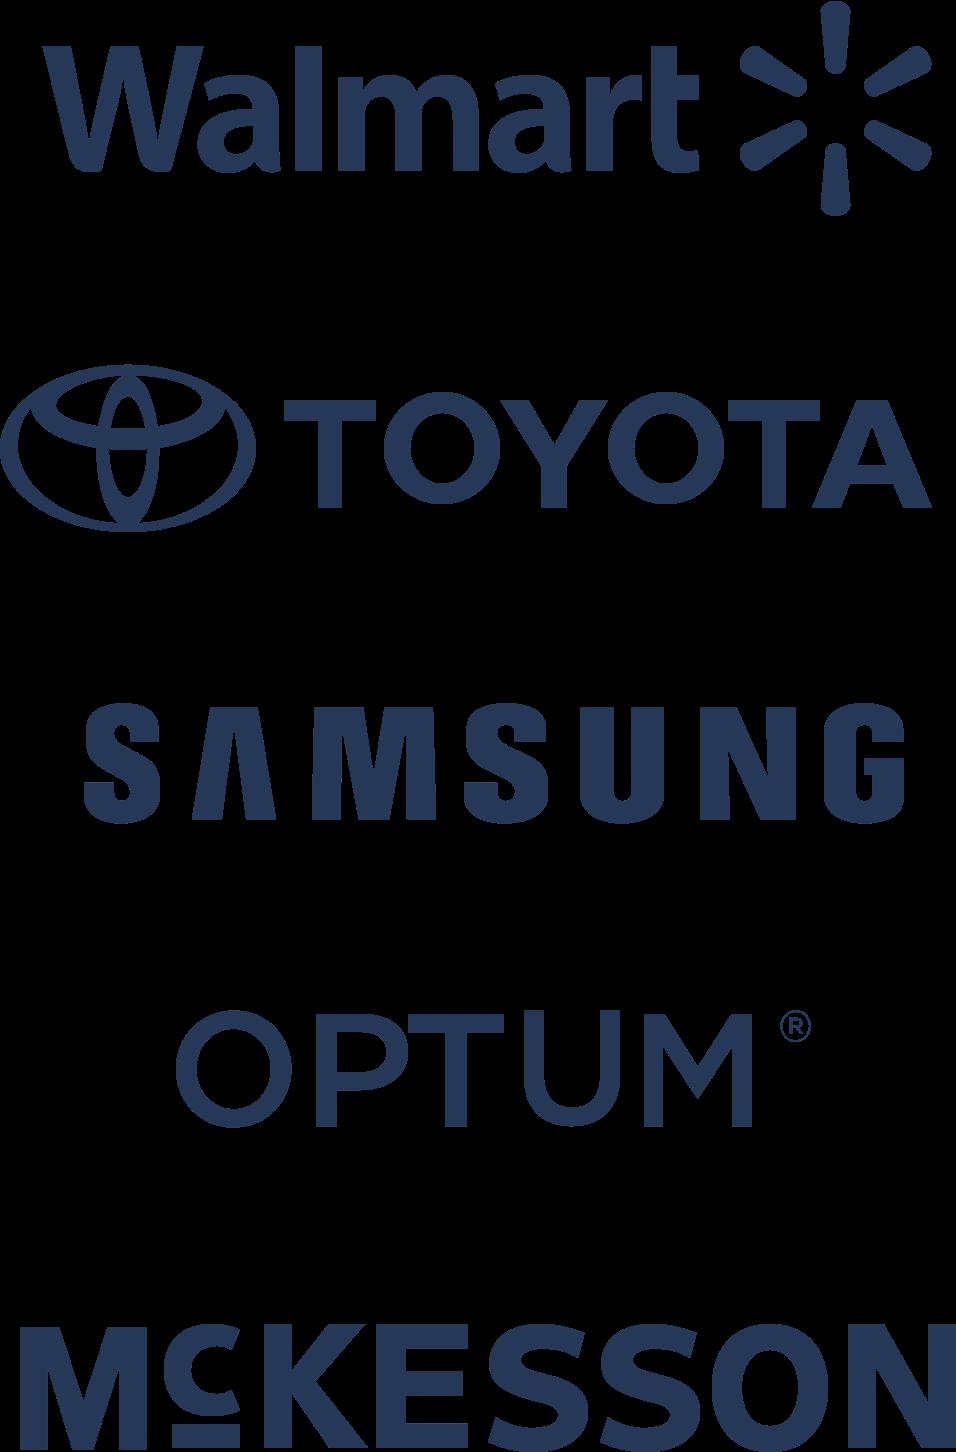 Logo di Walmart, Toyota, Samsung, Optum, McKesson